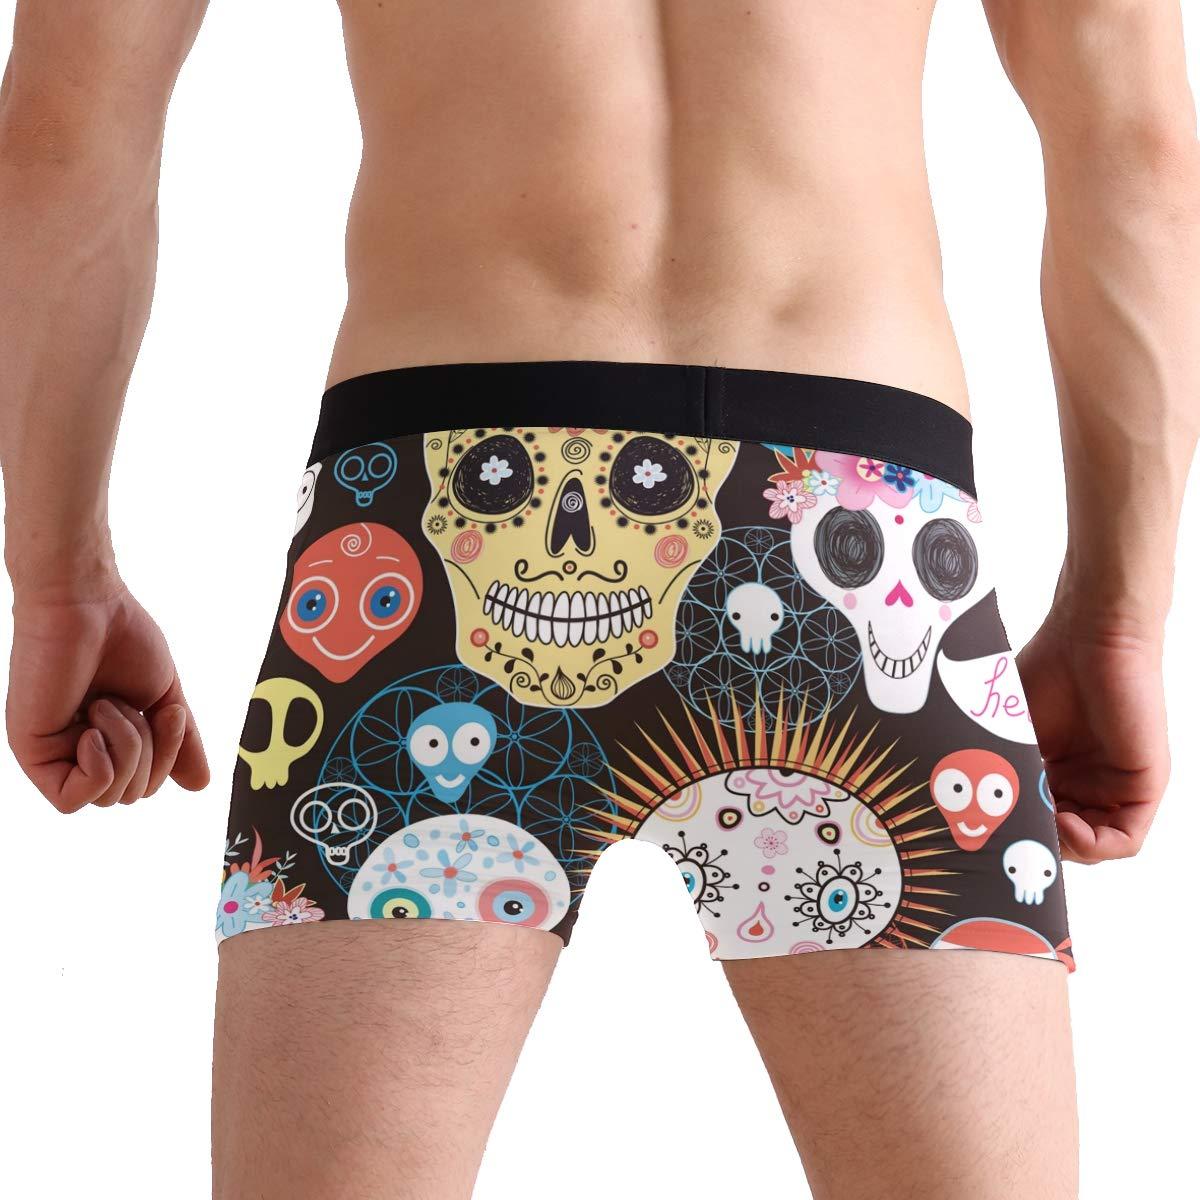 Mkuell Skull Comfortable Mens Boxer Briefs Multi-Size Soft Underwear S